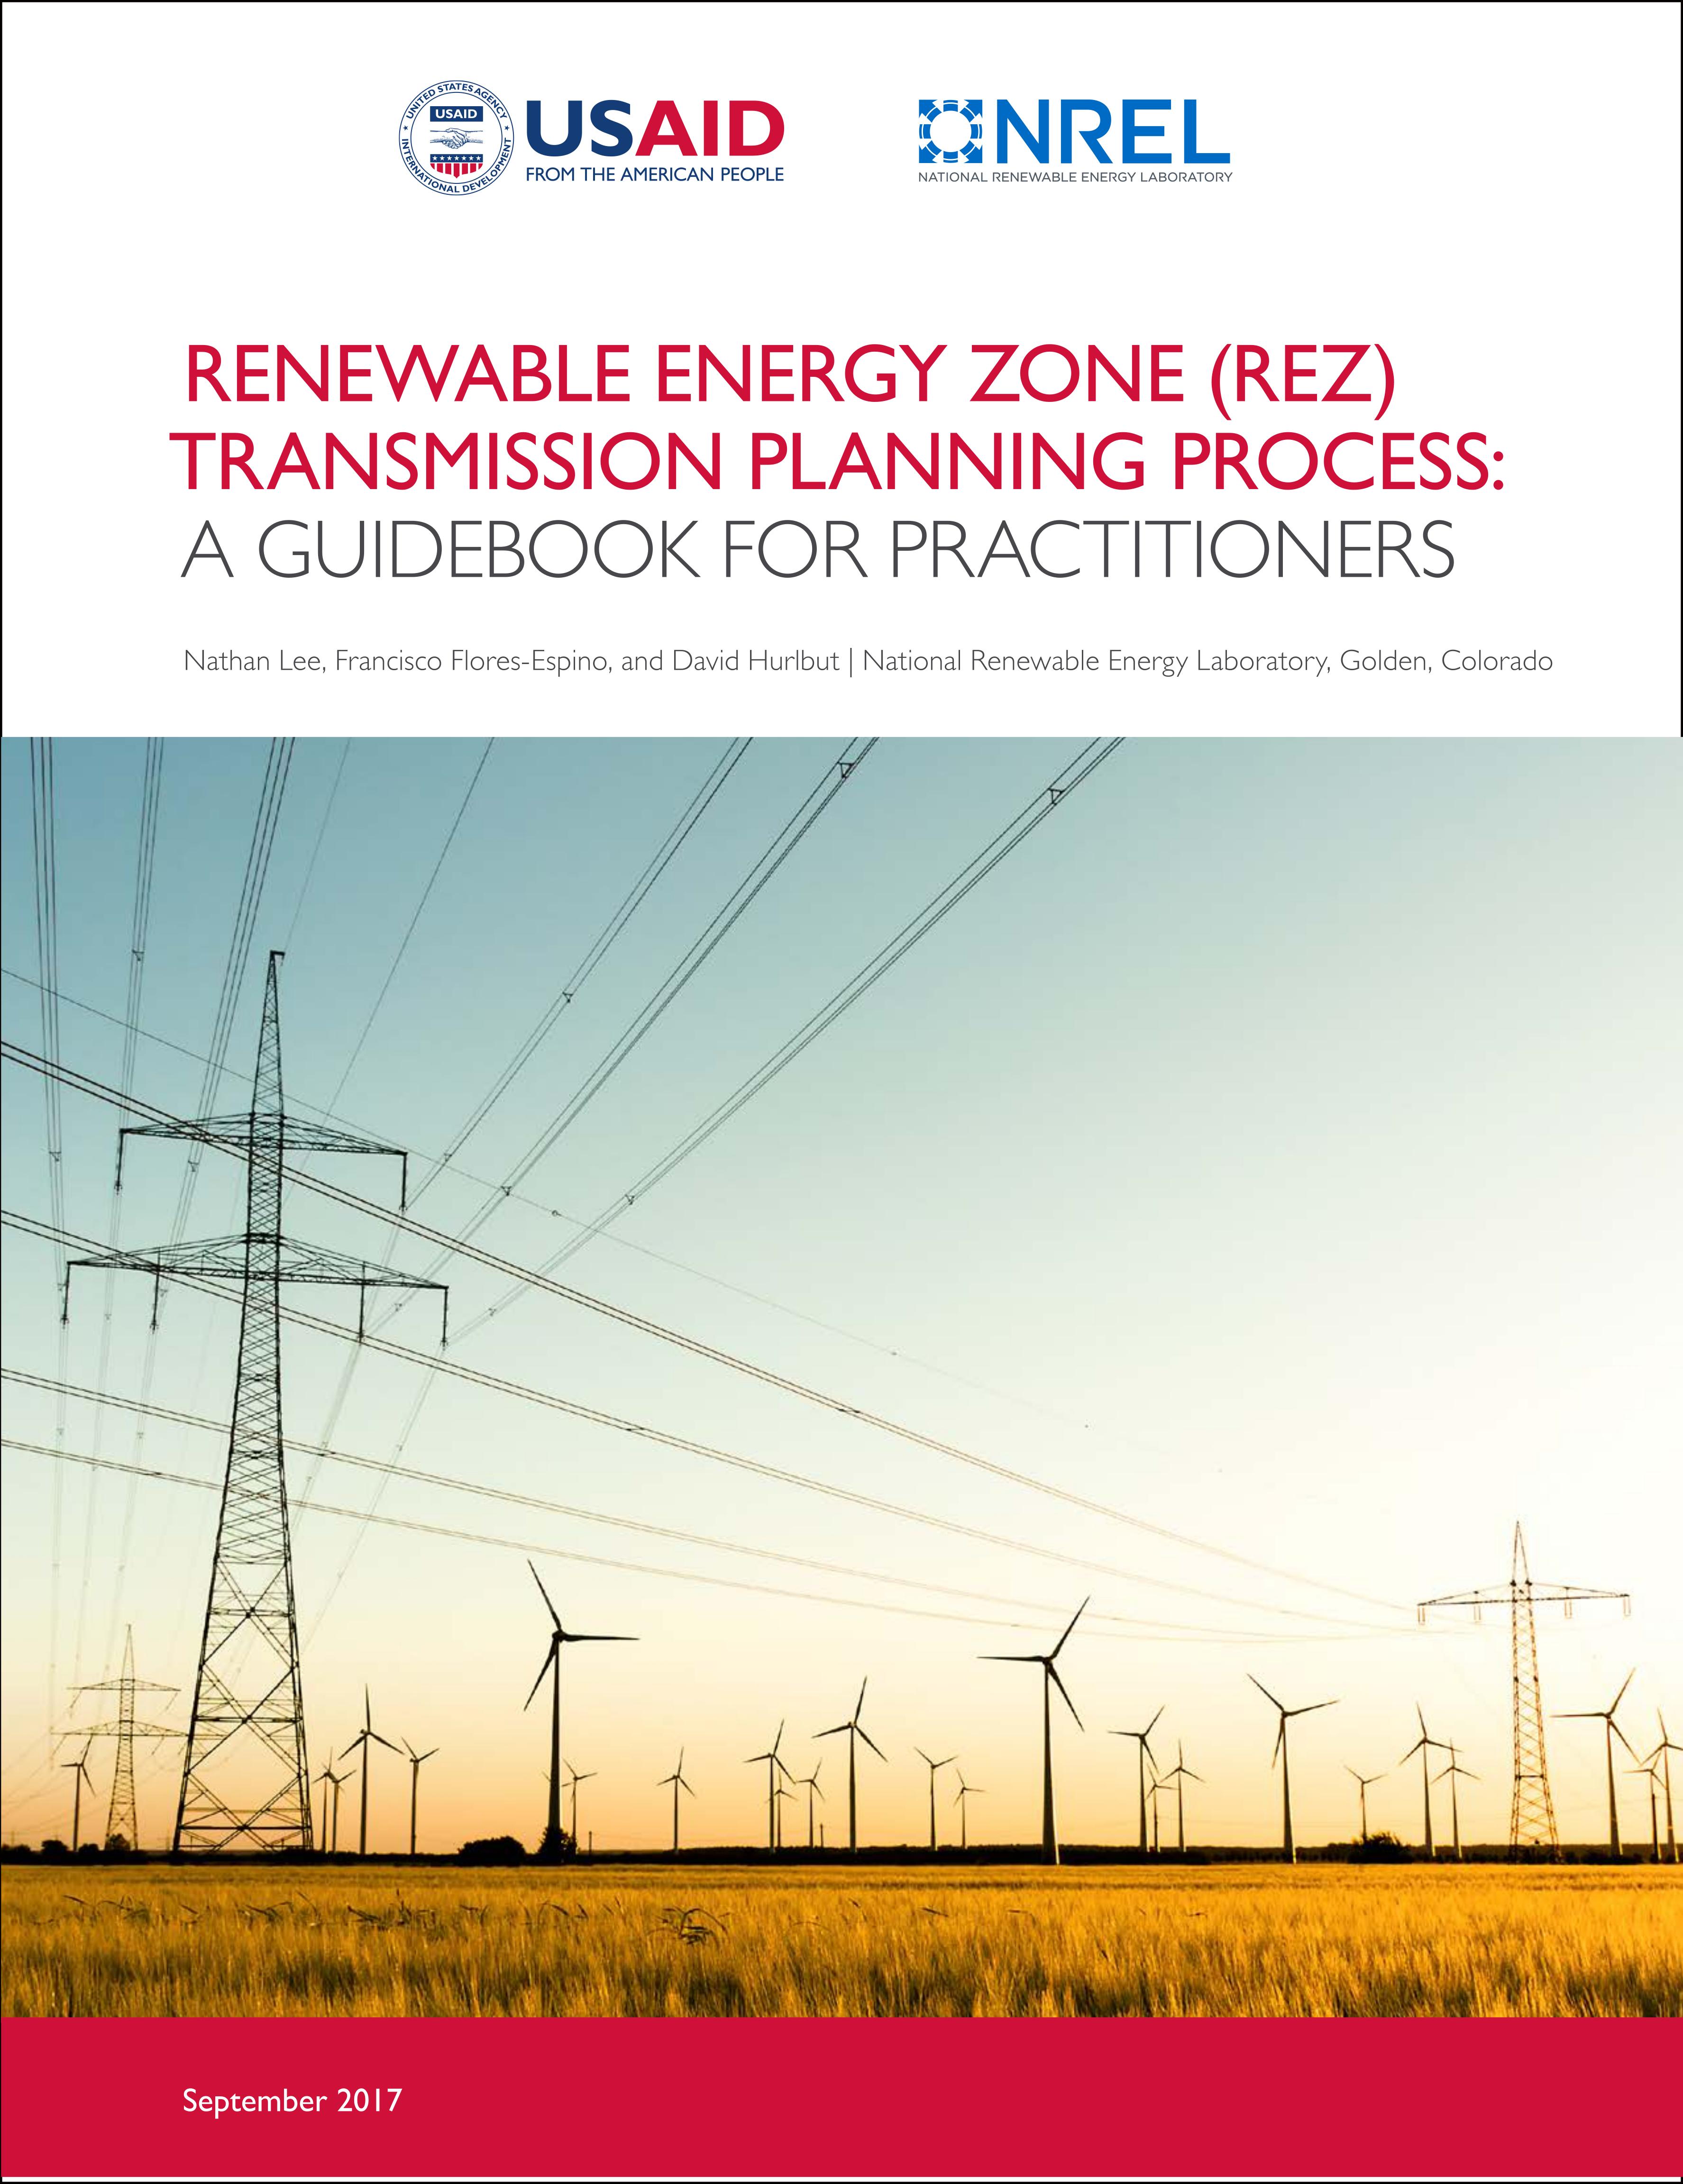 Download REZ Guidebook